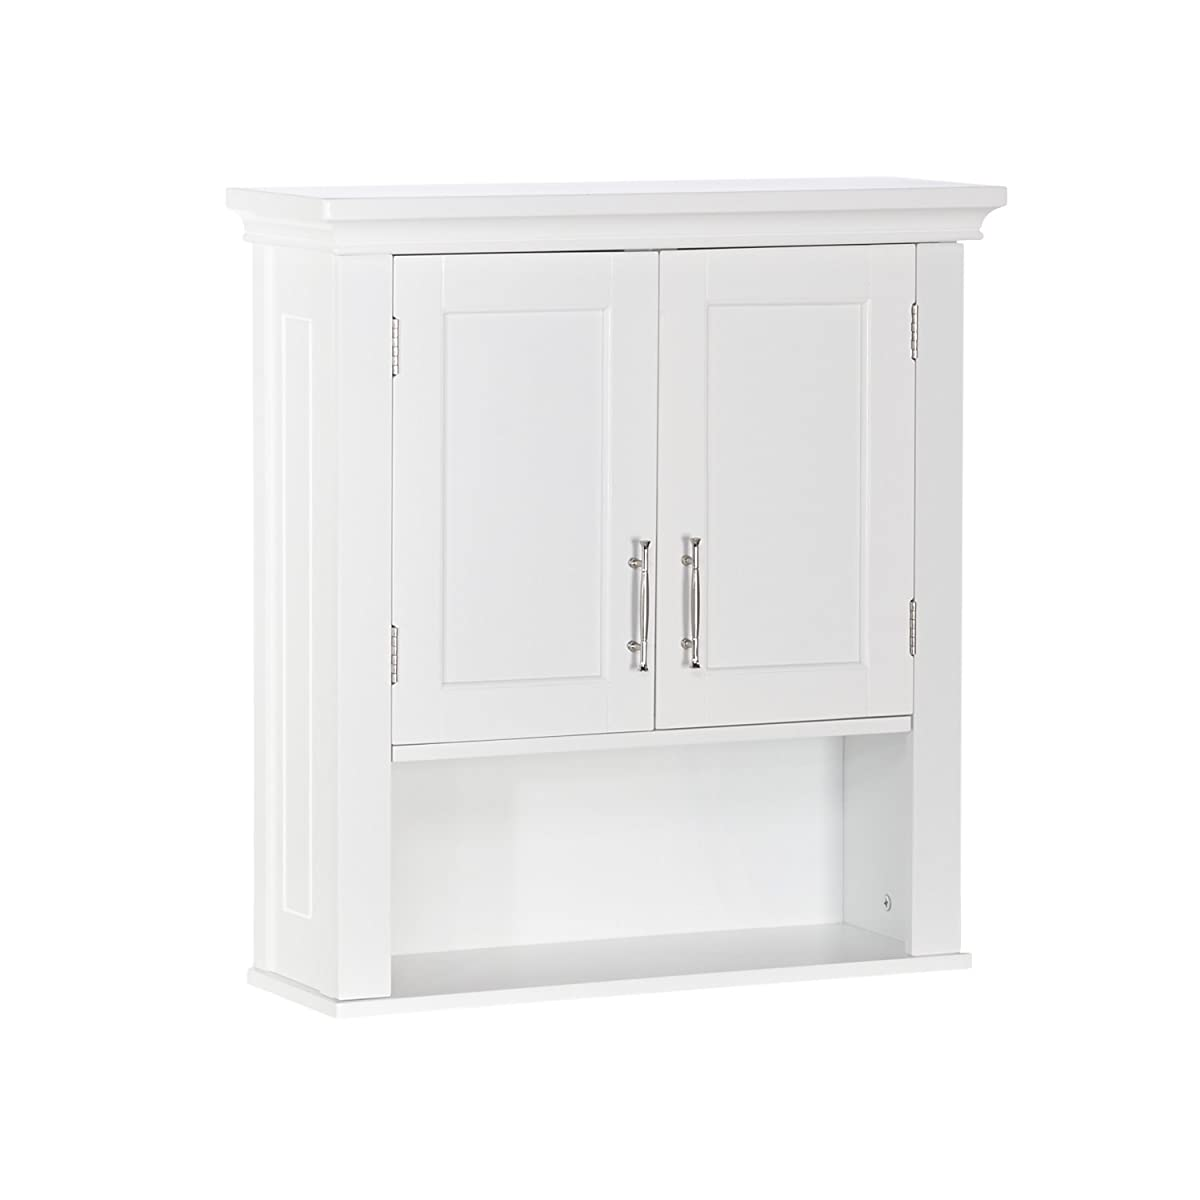 RiverRidge Home Somerset Wall Cabinet, White